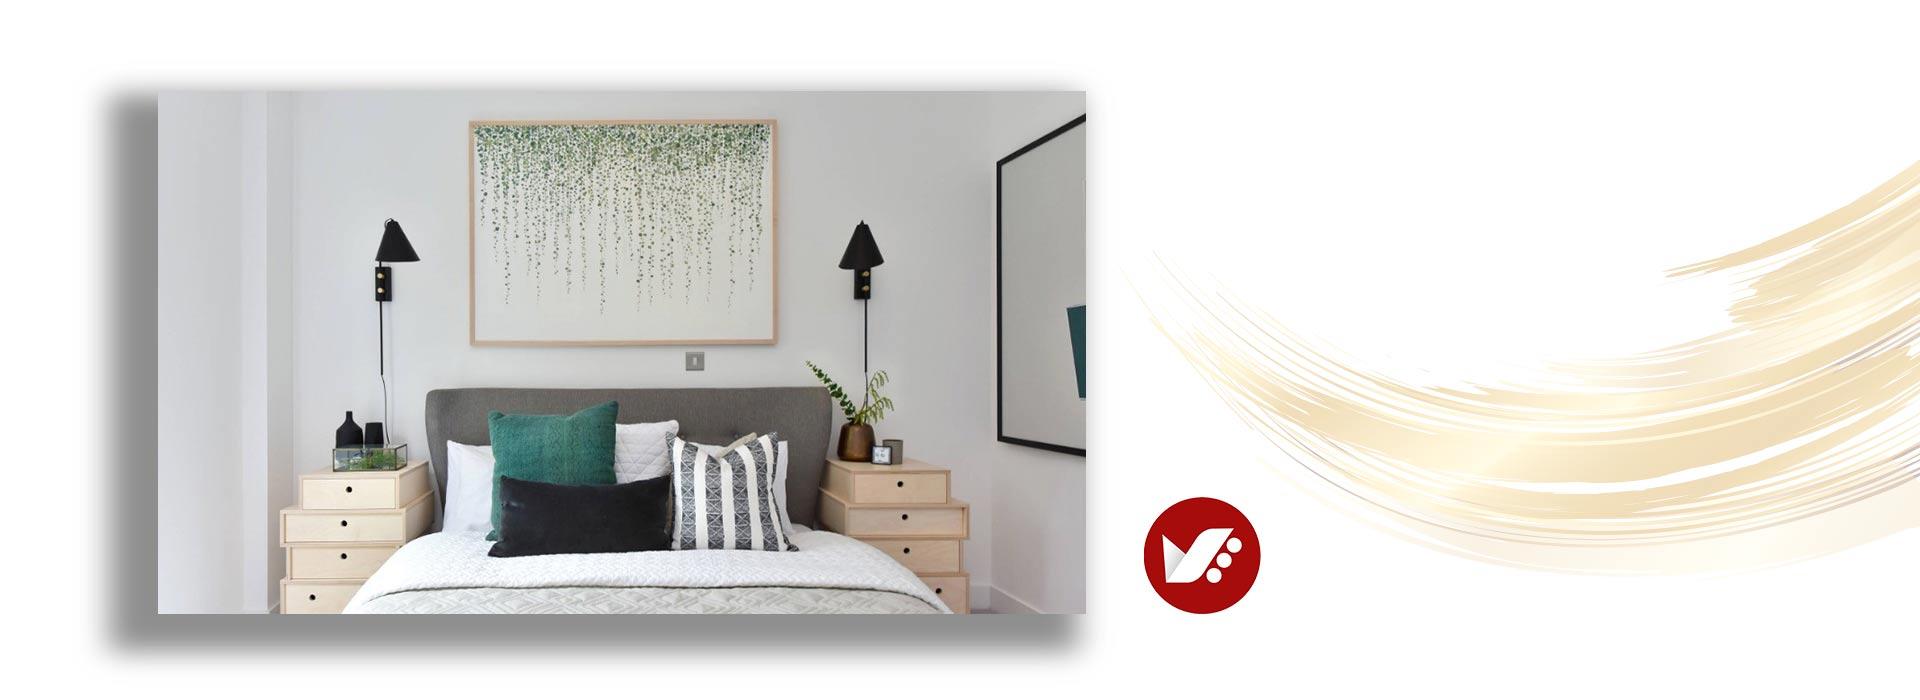 bedroom makeover 9jpg - تغییر دکوراسیون اتاق خواب